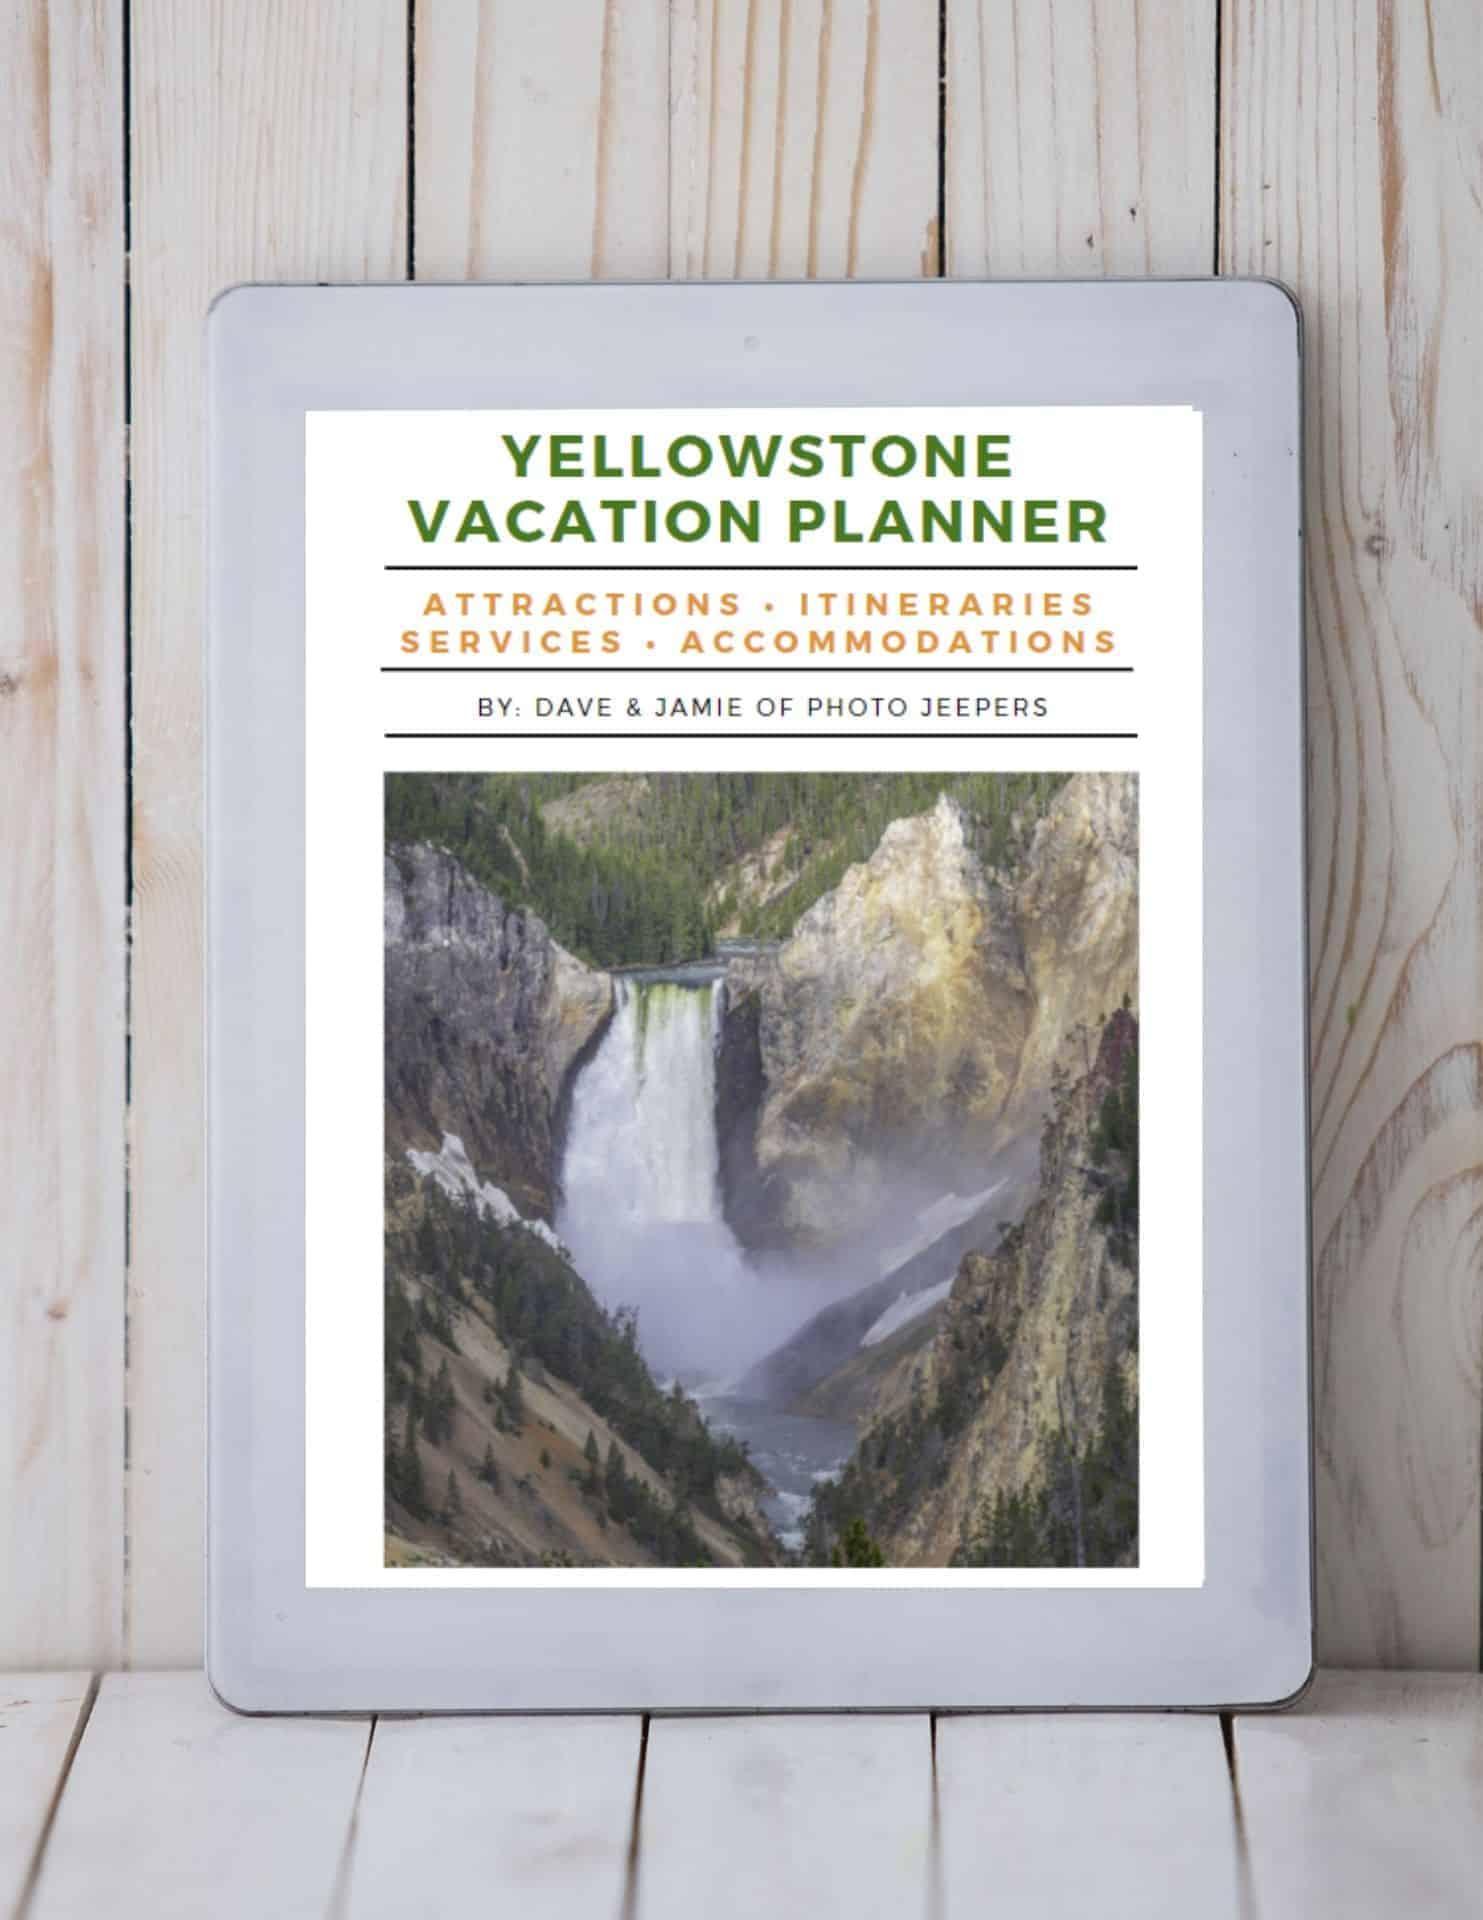 Yellowstone vacation planner